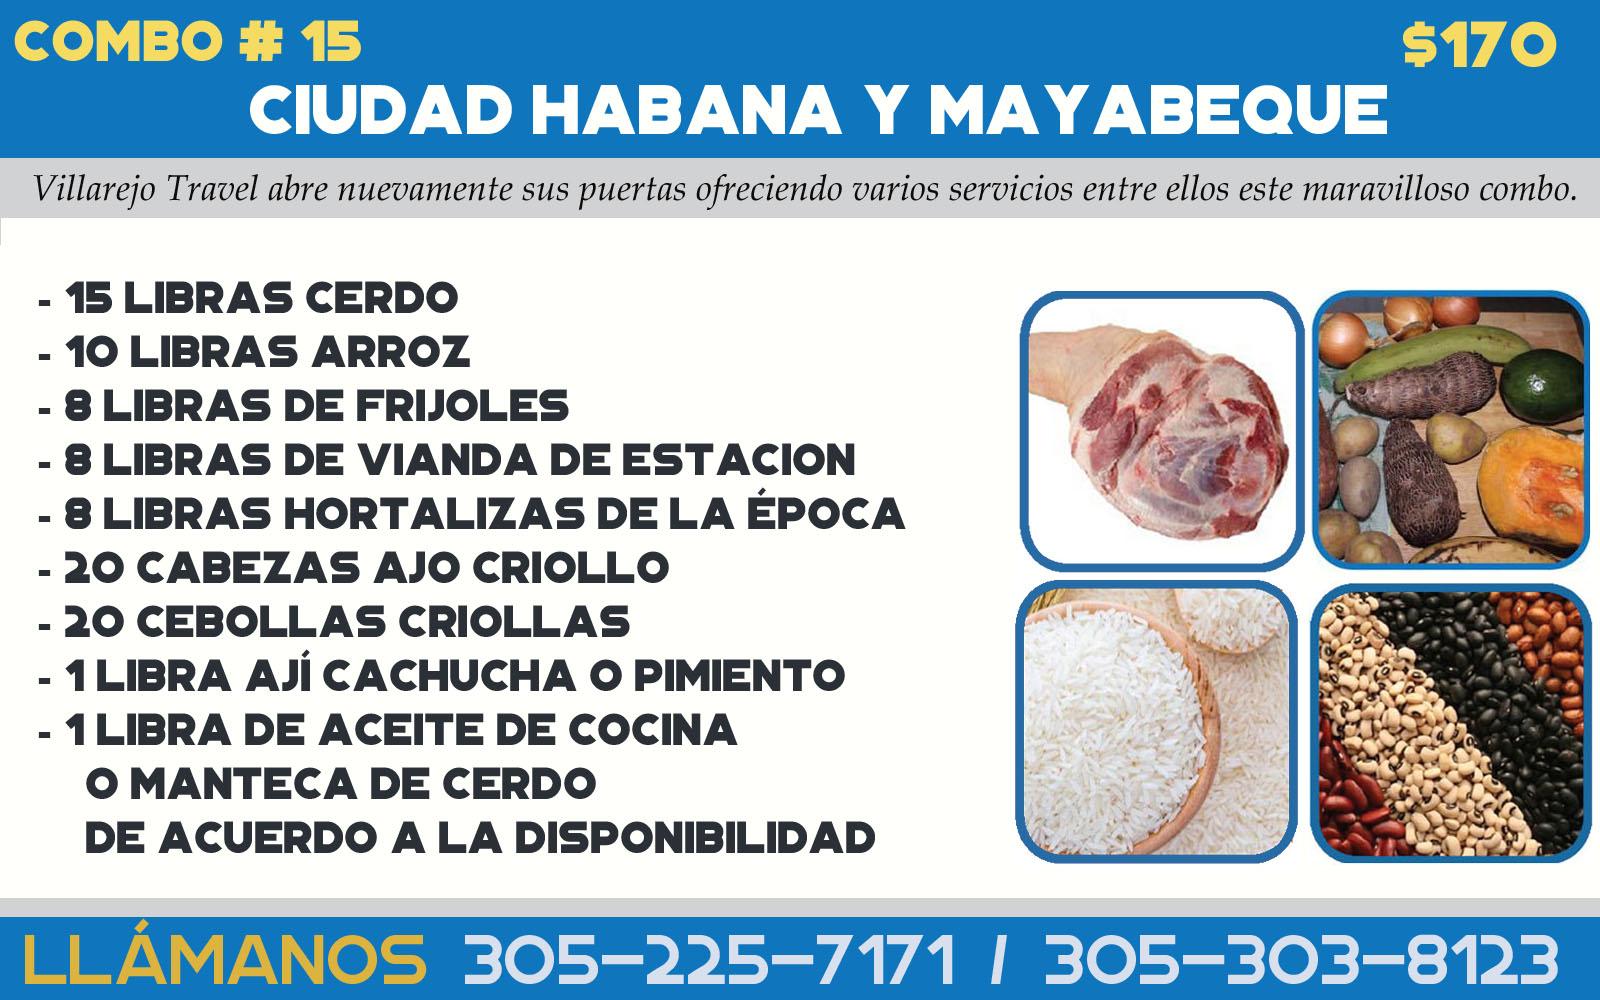 Combo #15 Habana, Mayabeque y Artemisa